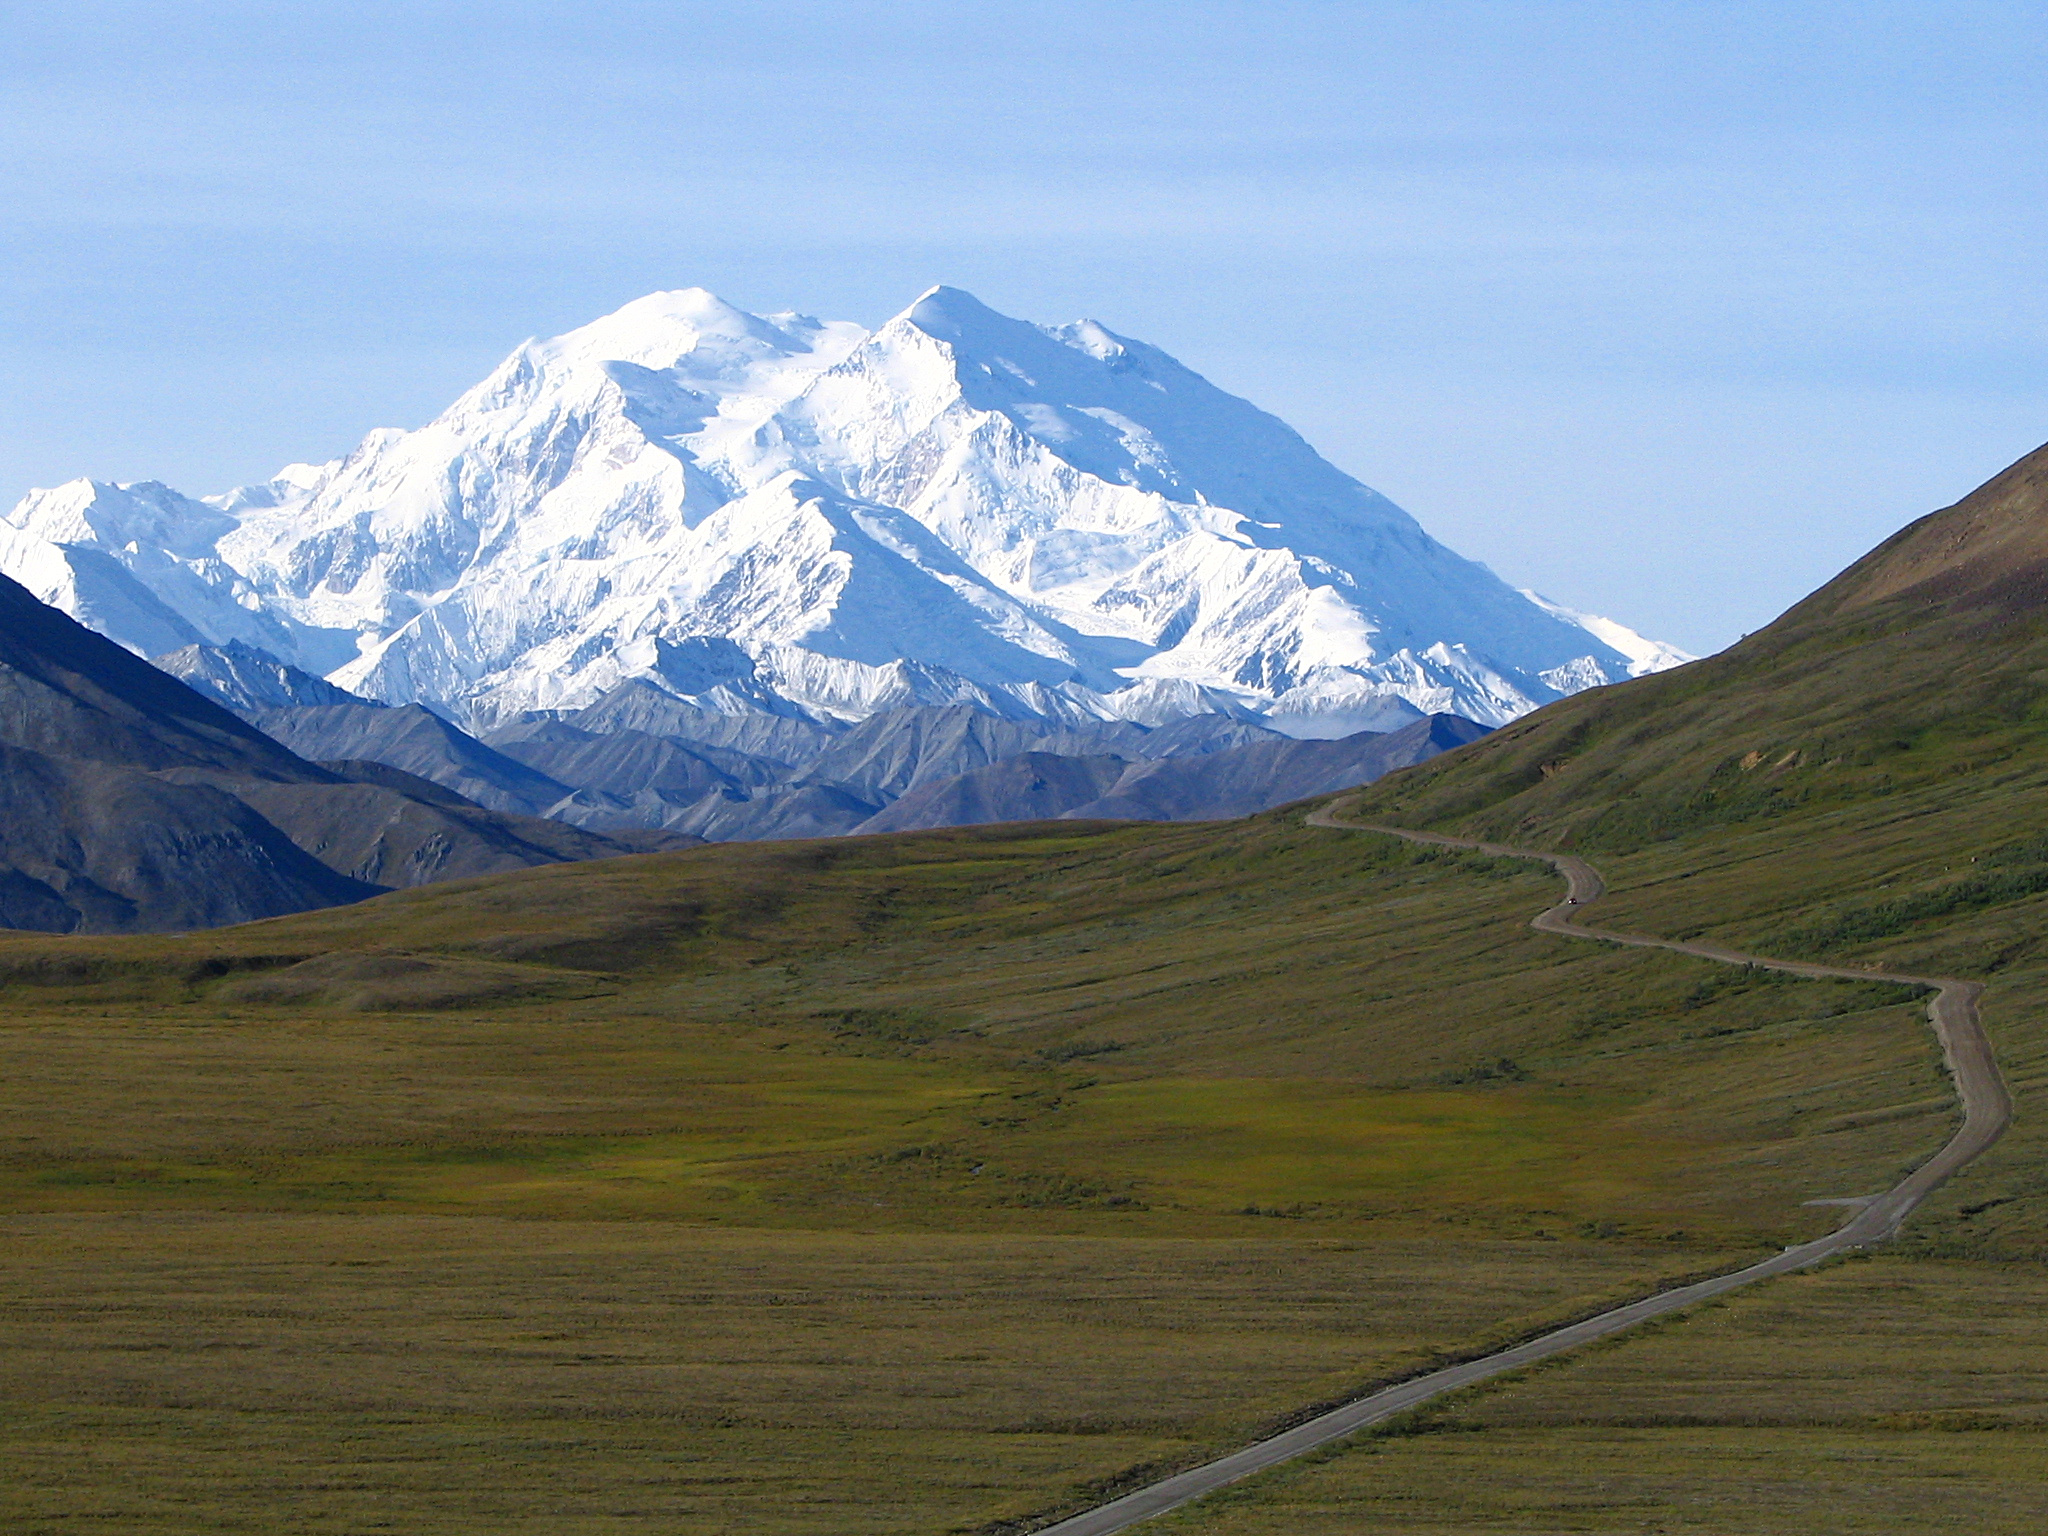 Denali, Alaska – 20,320' (6194m)